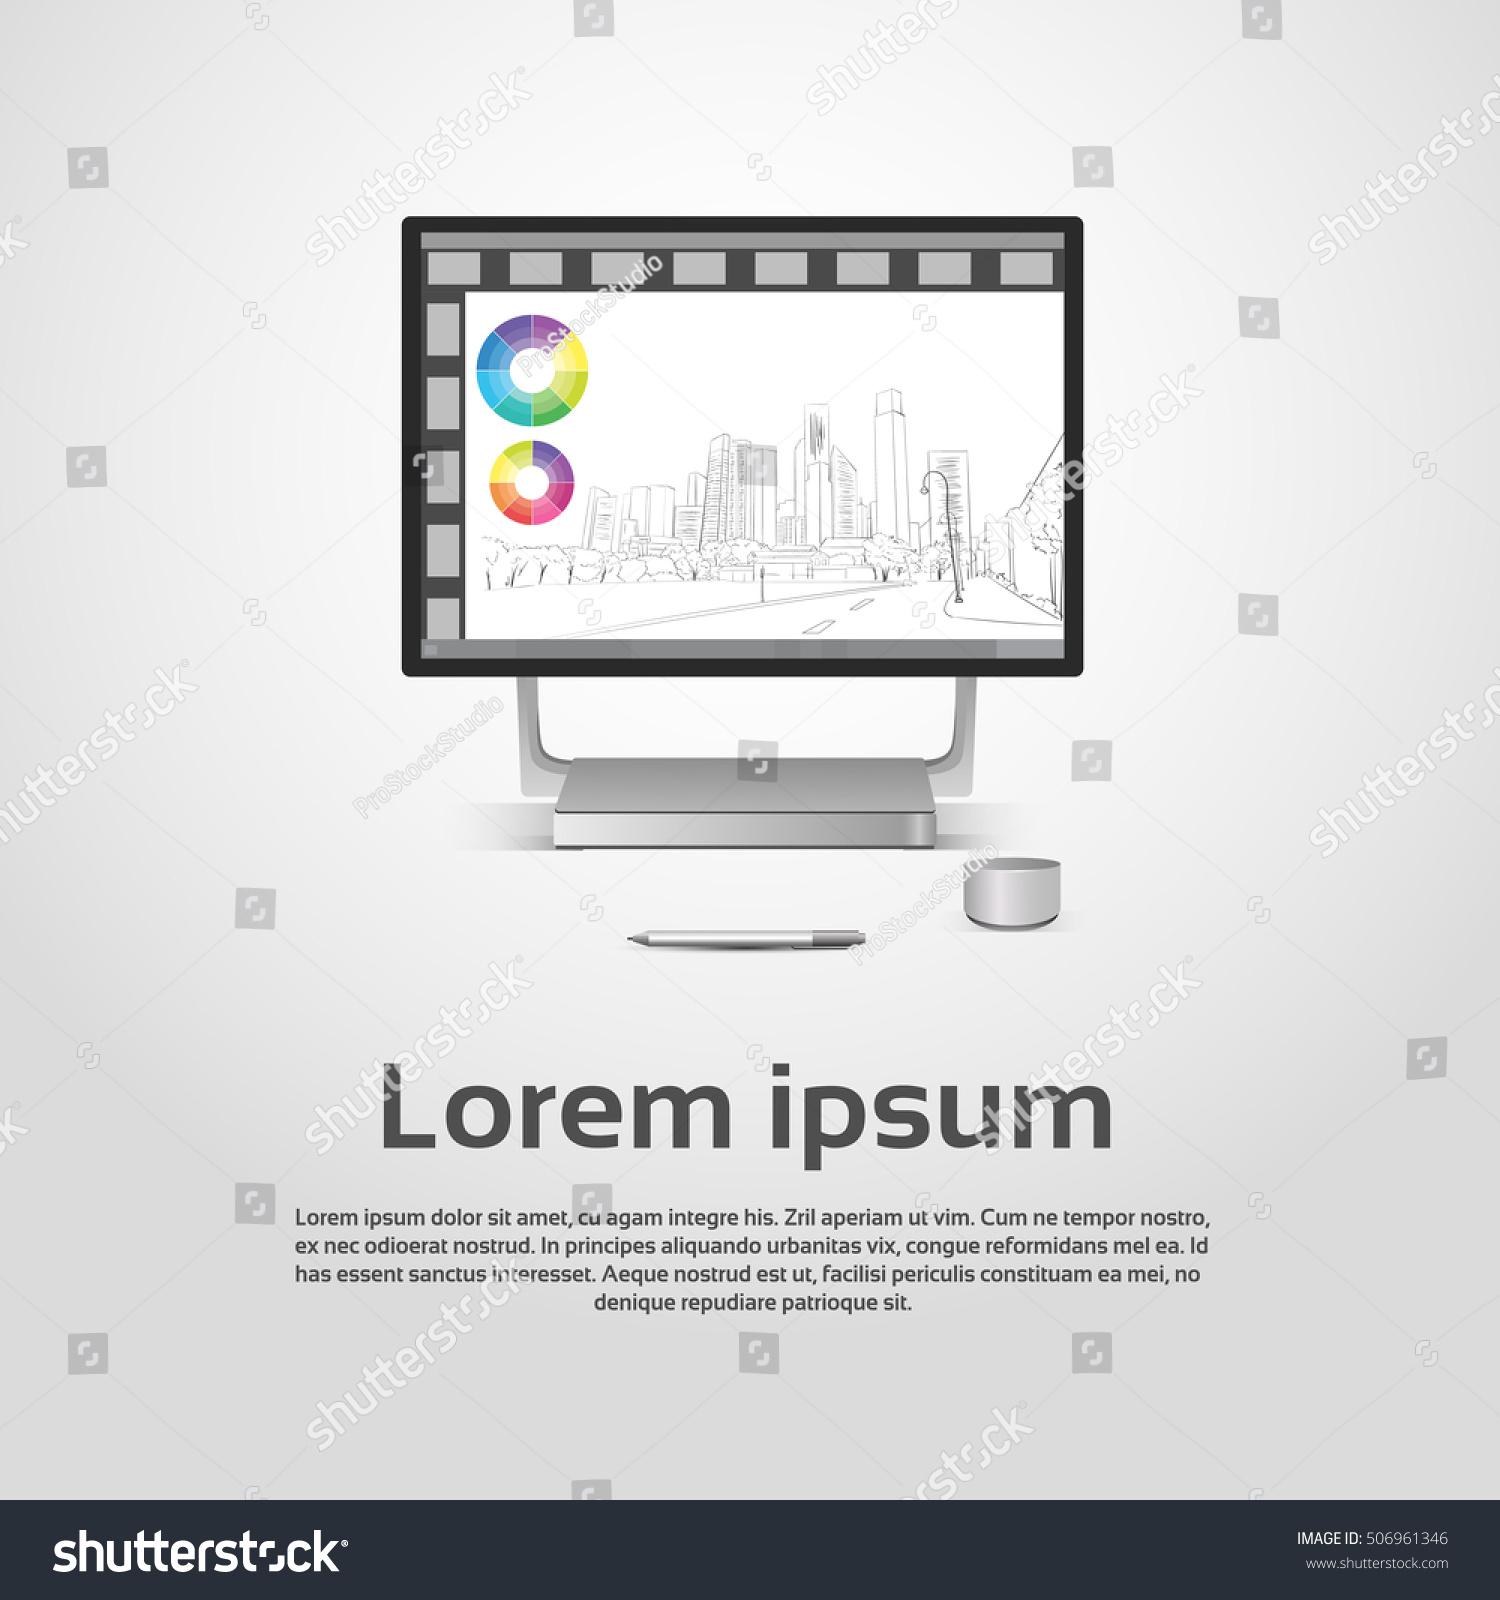 hight resolution of desktop logo modern computer workstation icon monitor financial graph diagram infographic vector illustration